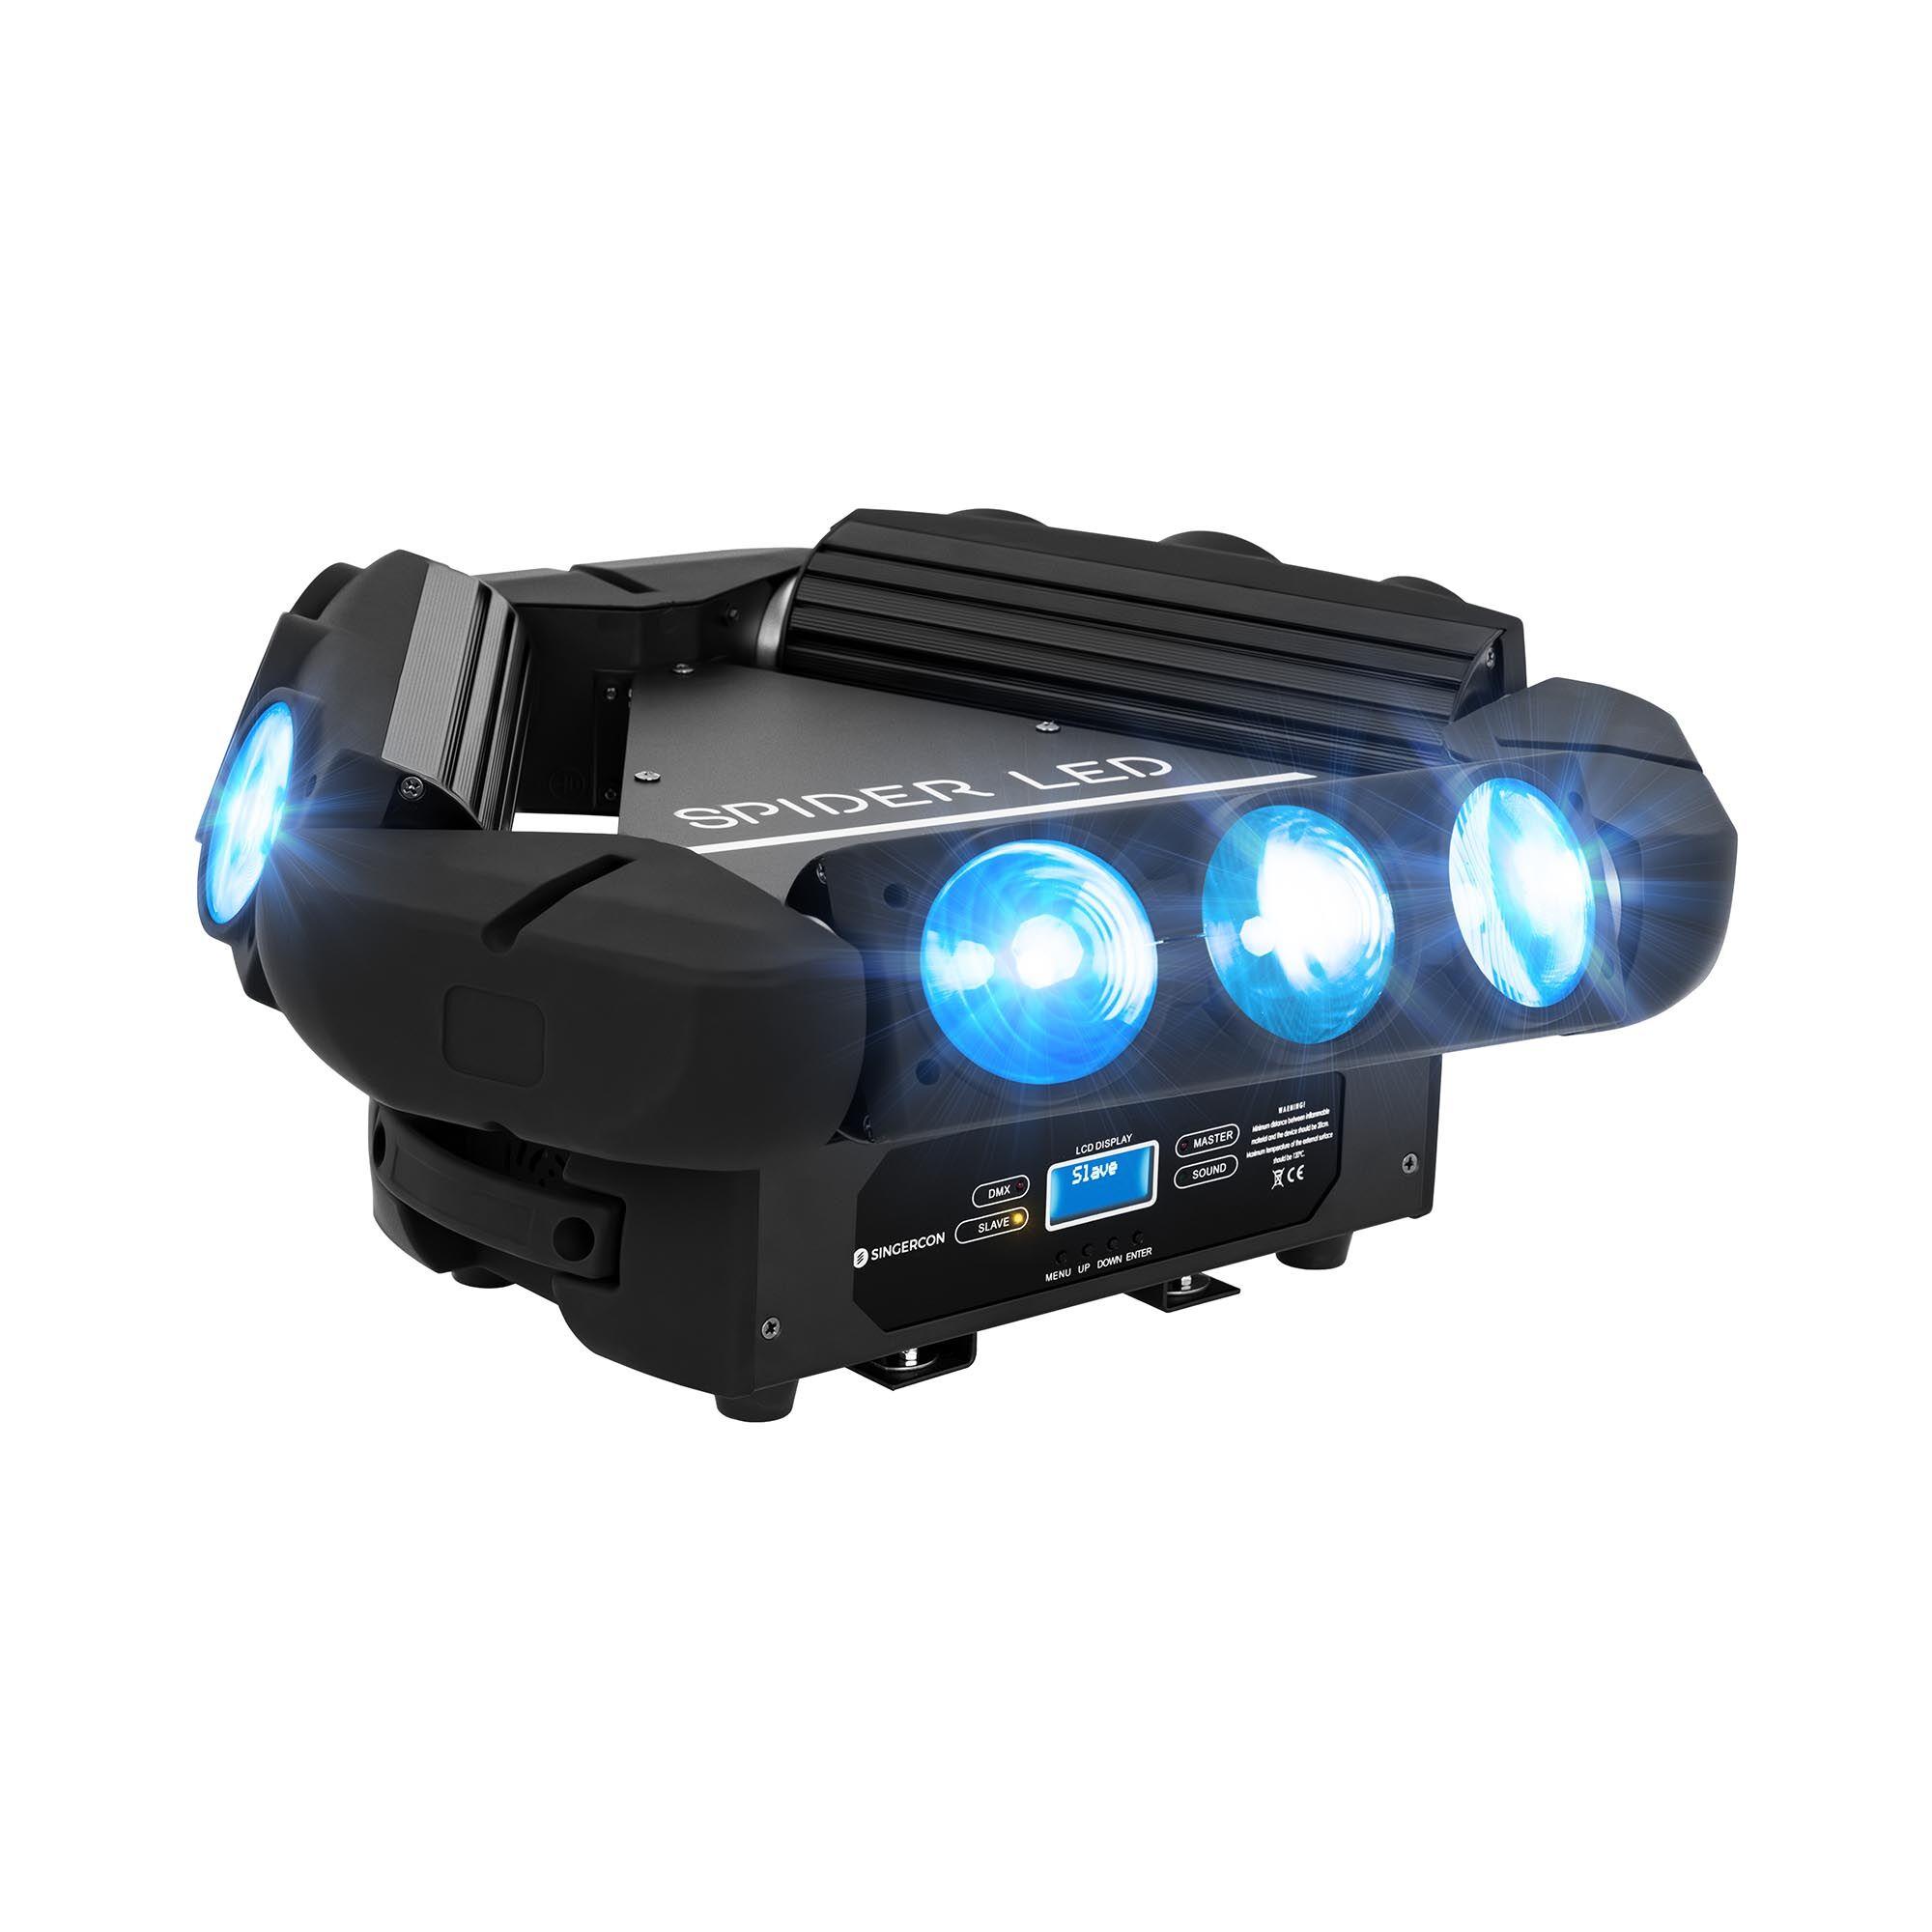 Singercon Lyre Spider - 9 LED - 100 W CON.LMH-9/10/RGB